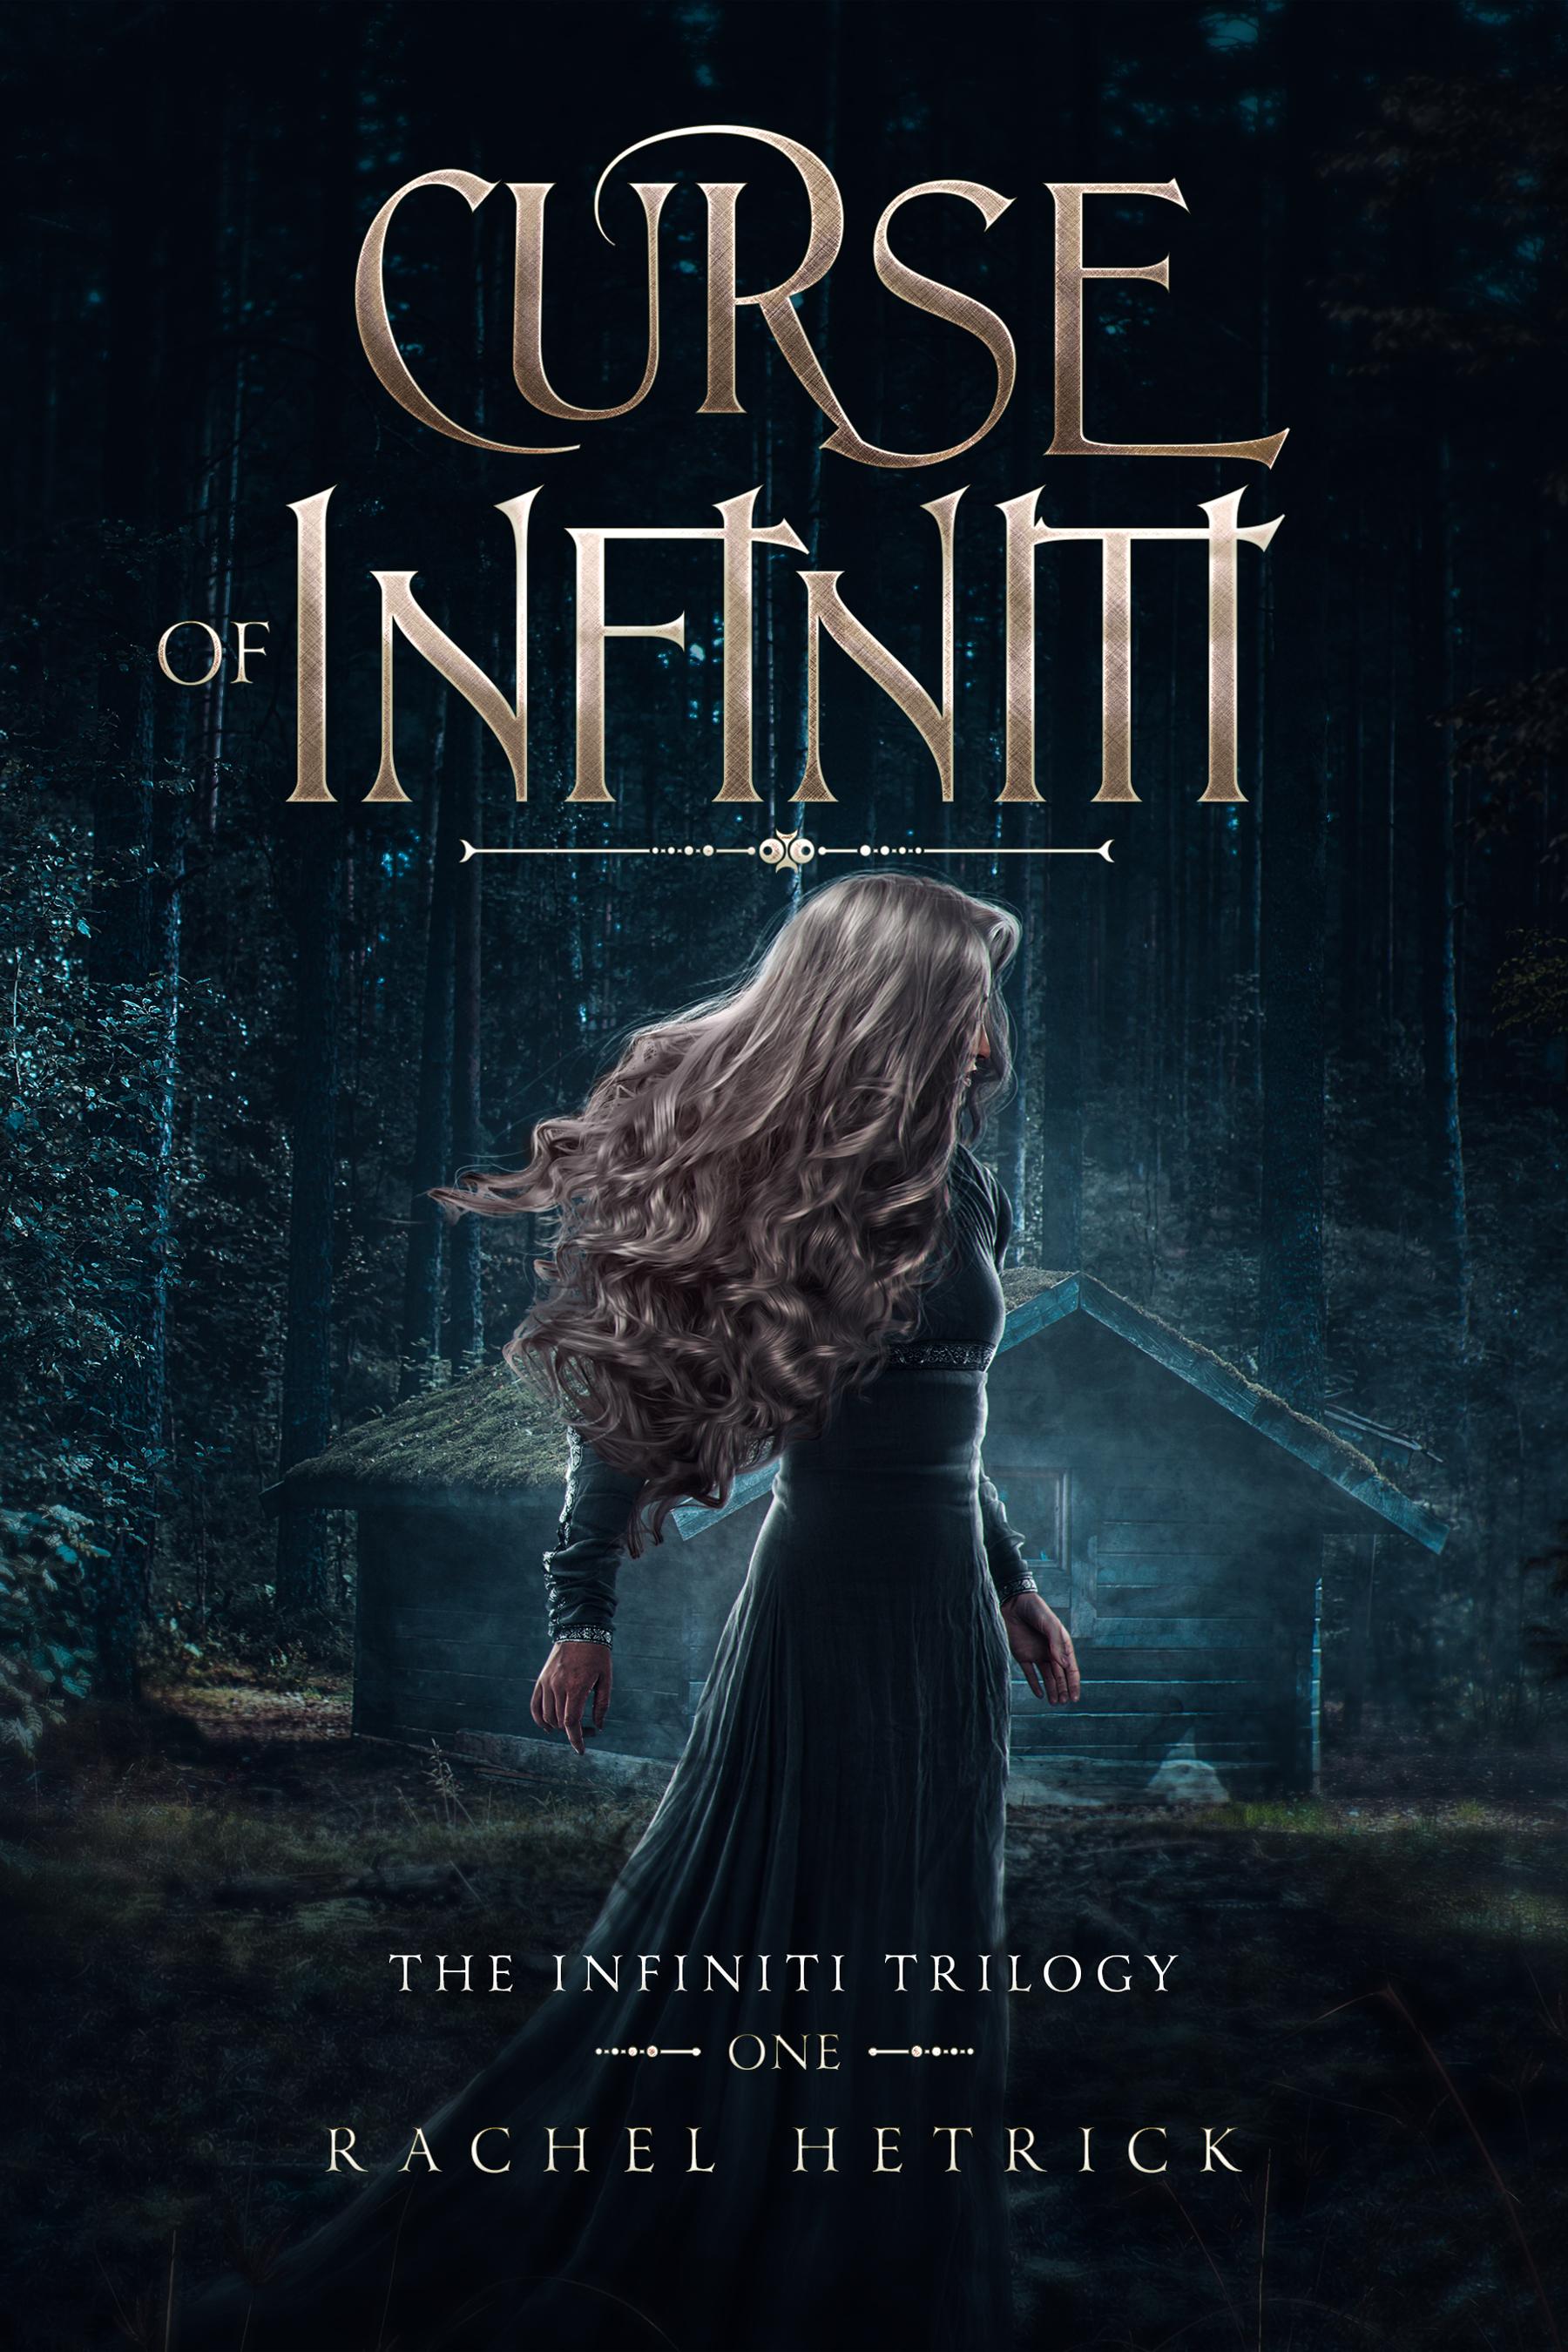 Curse of Infiniti (The Infiniti Trilogy #1)